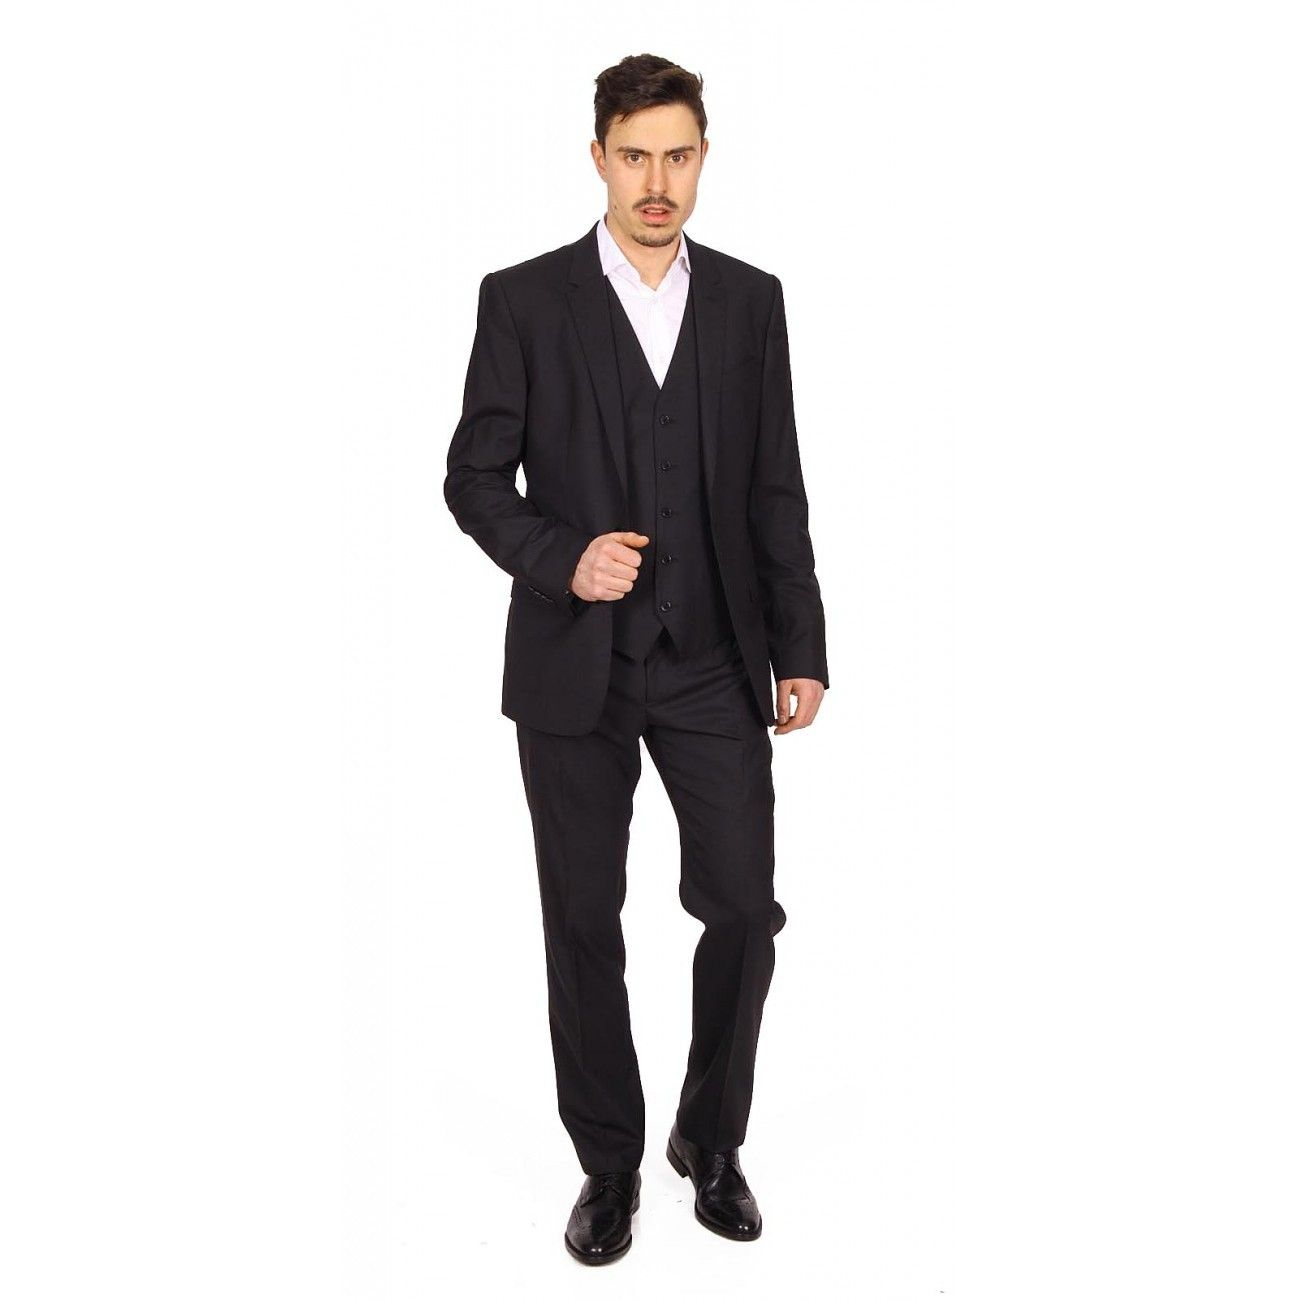 Dolce u gabbana martini mens suit with gilet ghnmt fubbg n